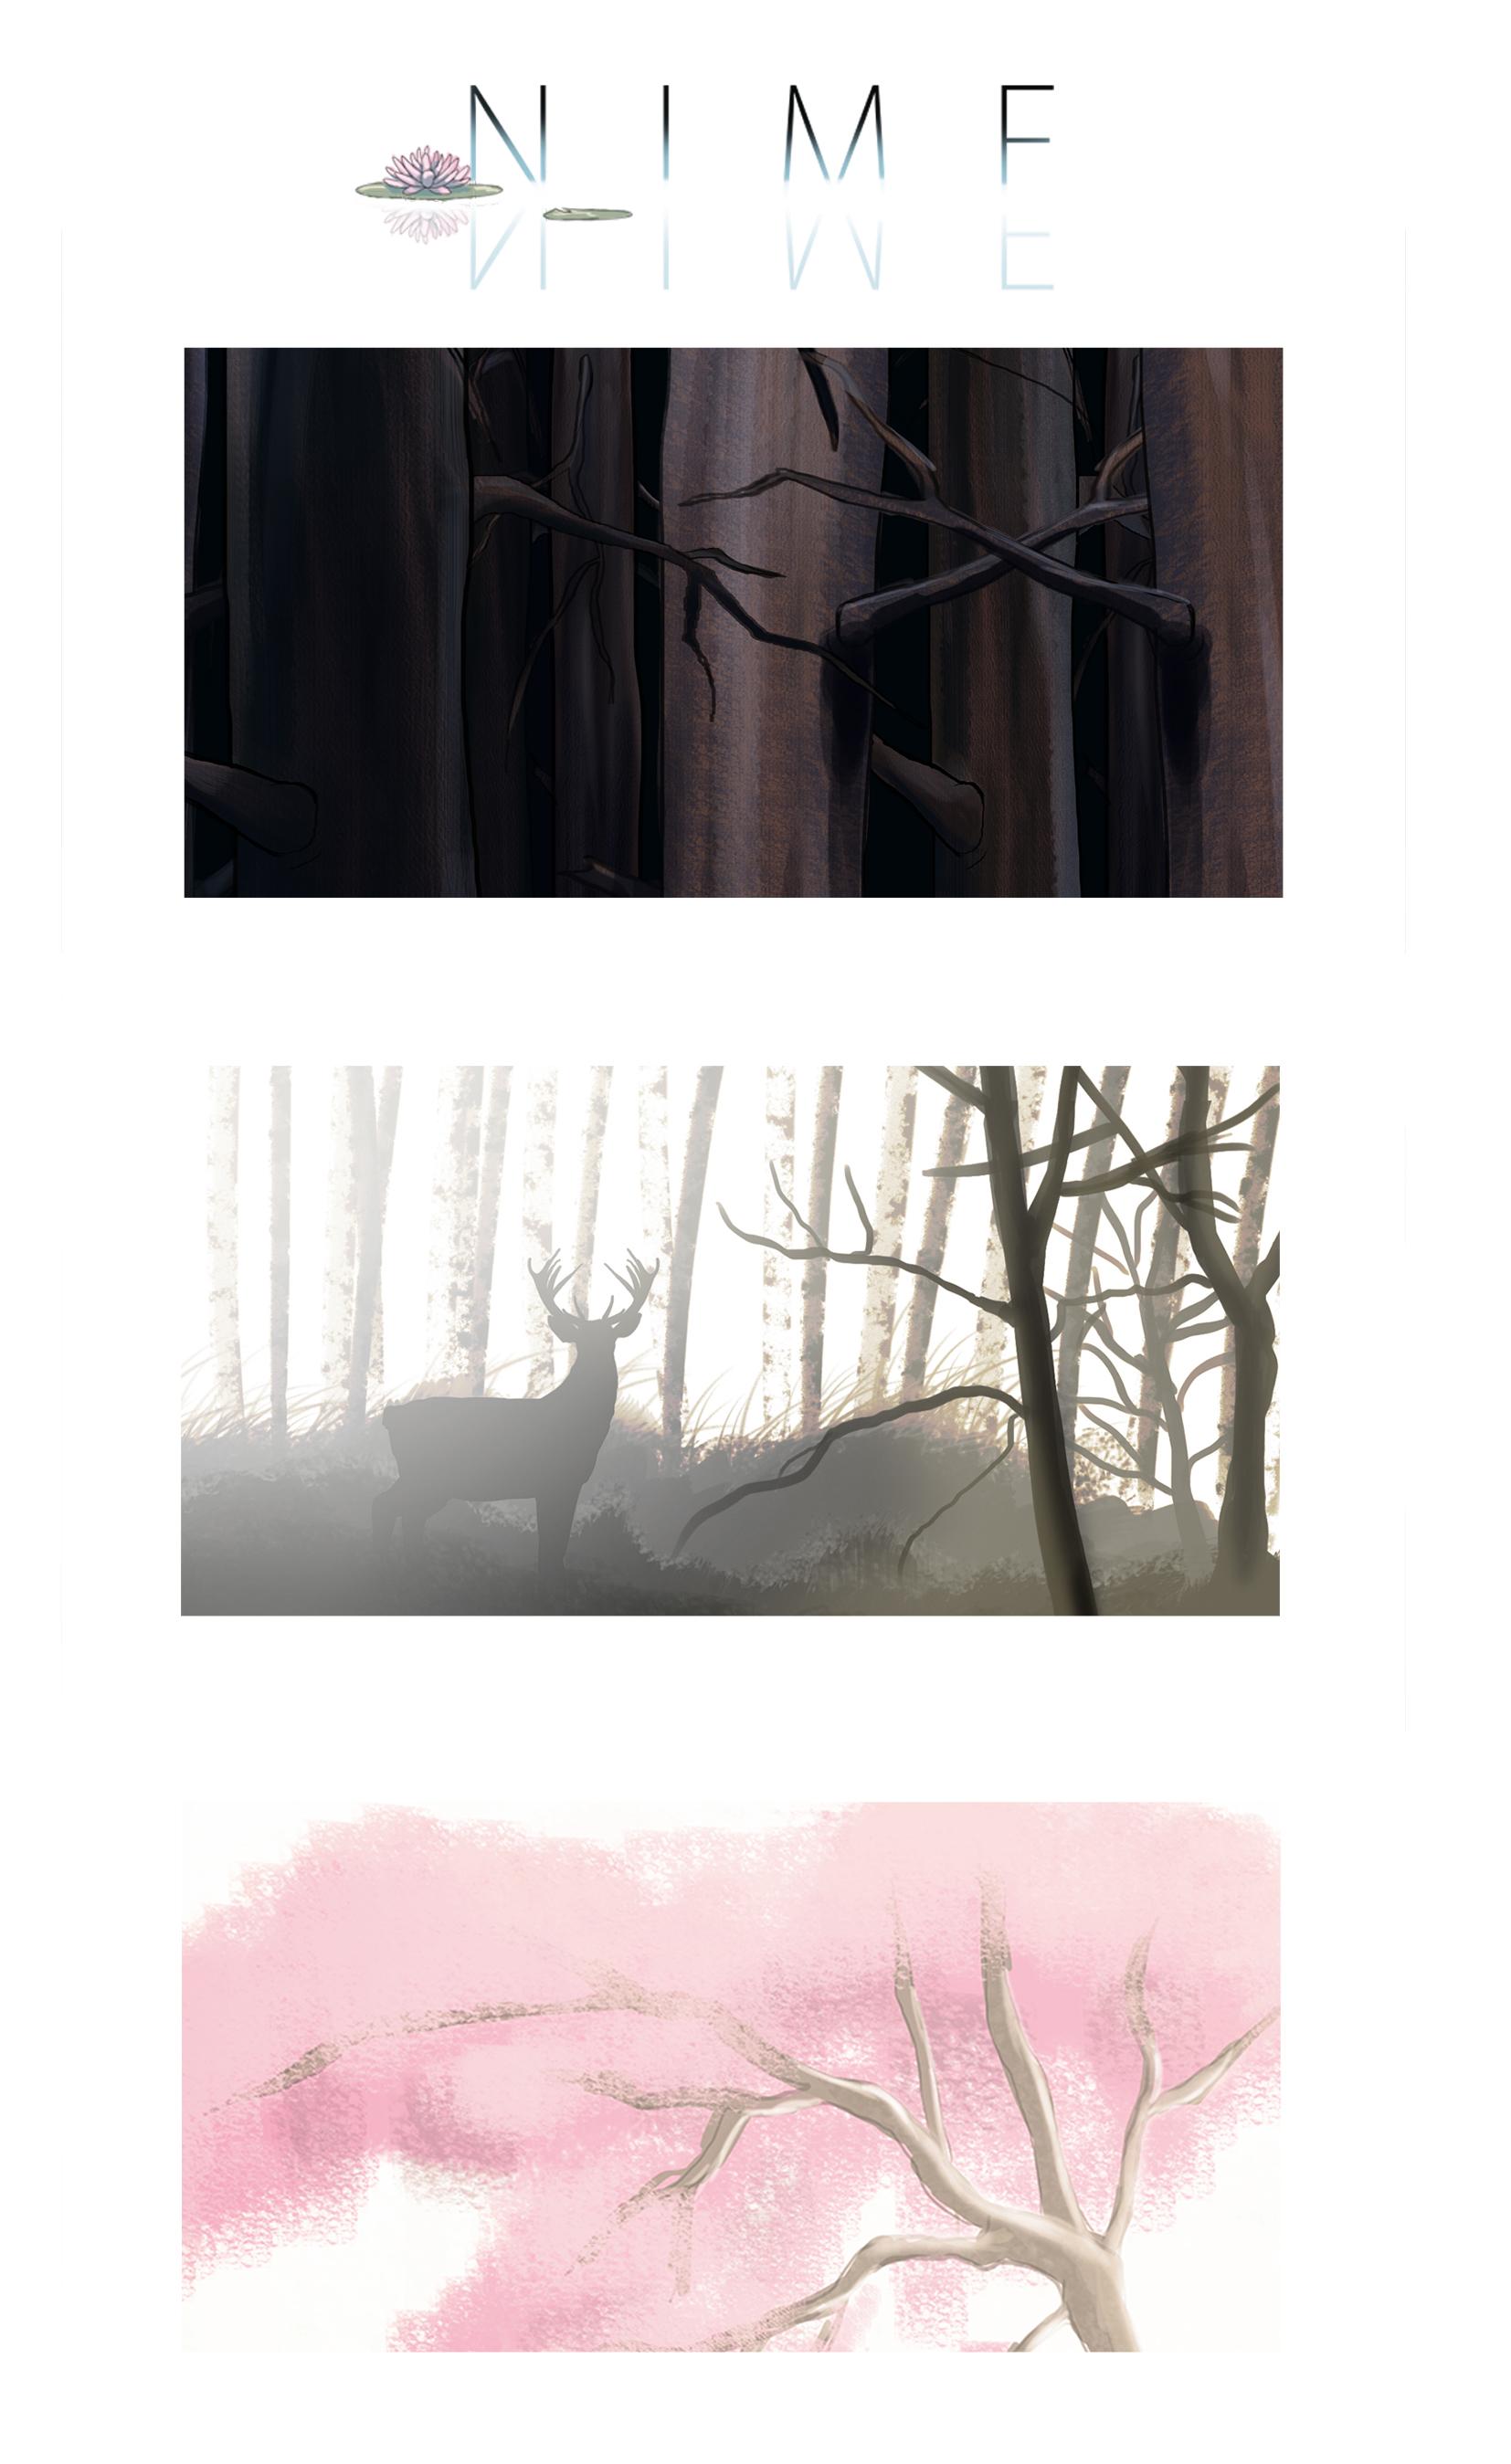 Nimf_animation_concept_art_BG_backgrounds_by_Suze Gil.jpg